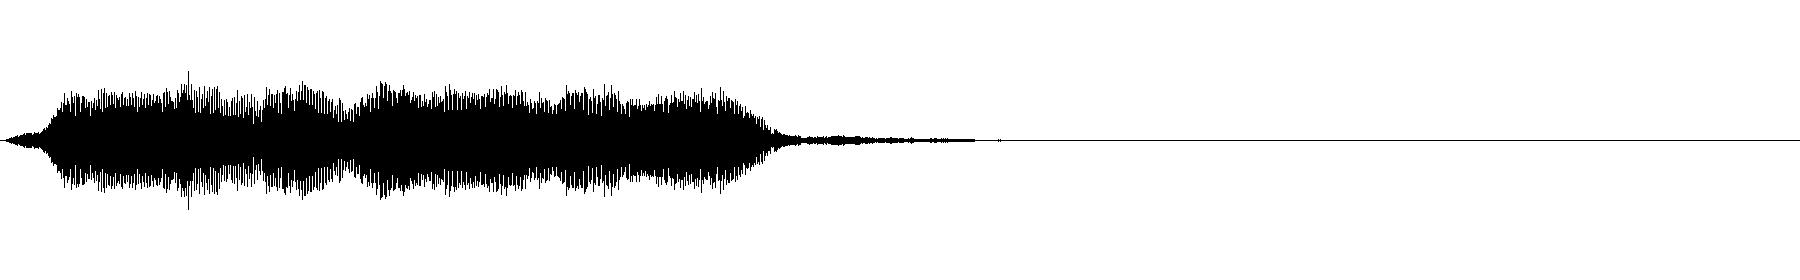 vox 68